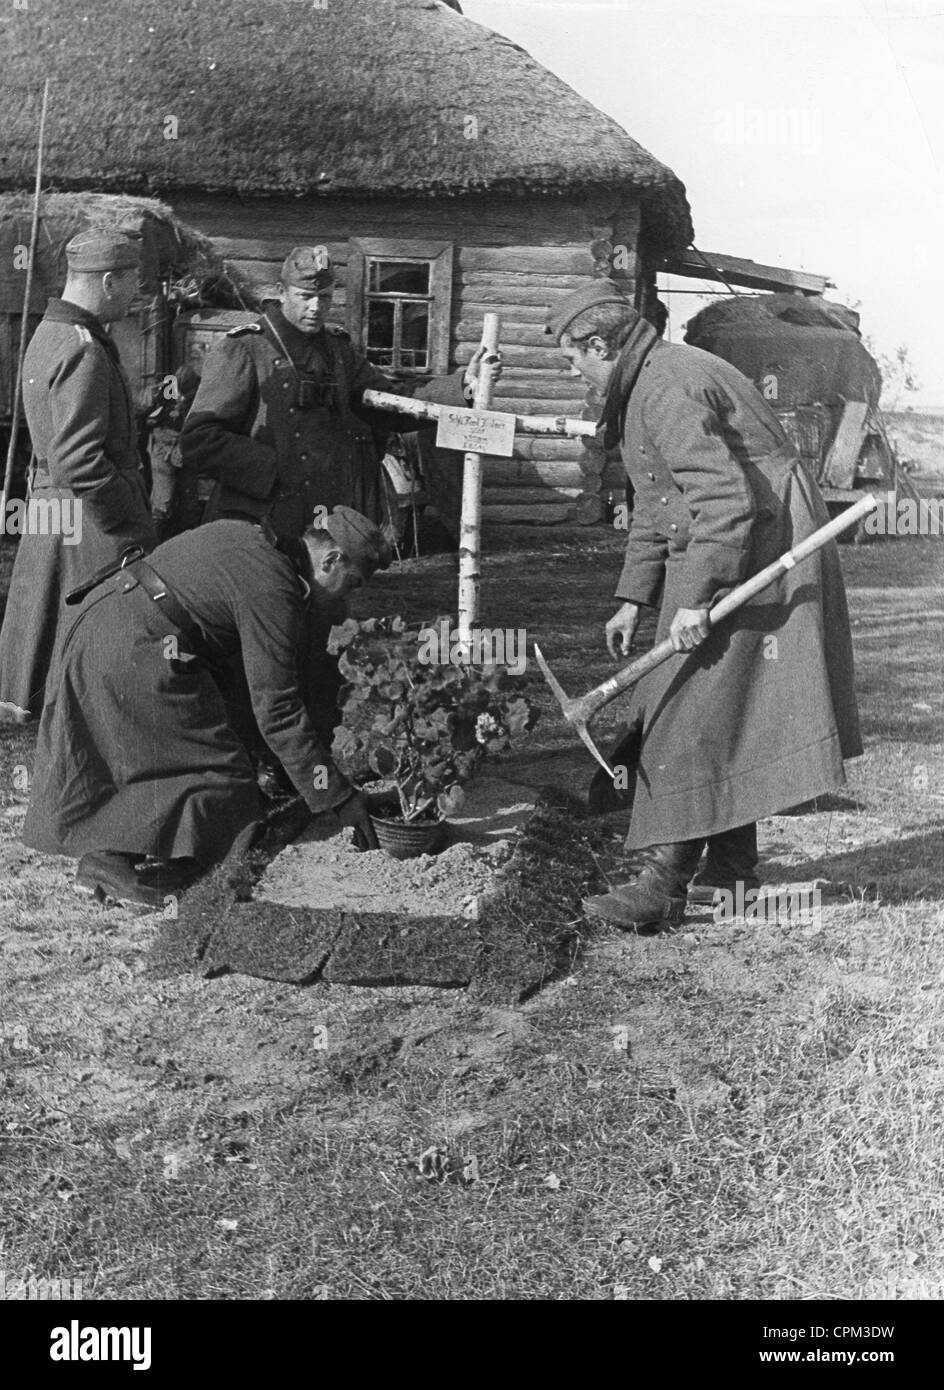 German soldiers bury a comrade, 1941 - Stock Image